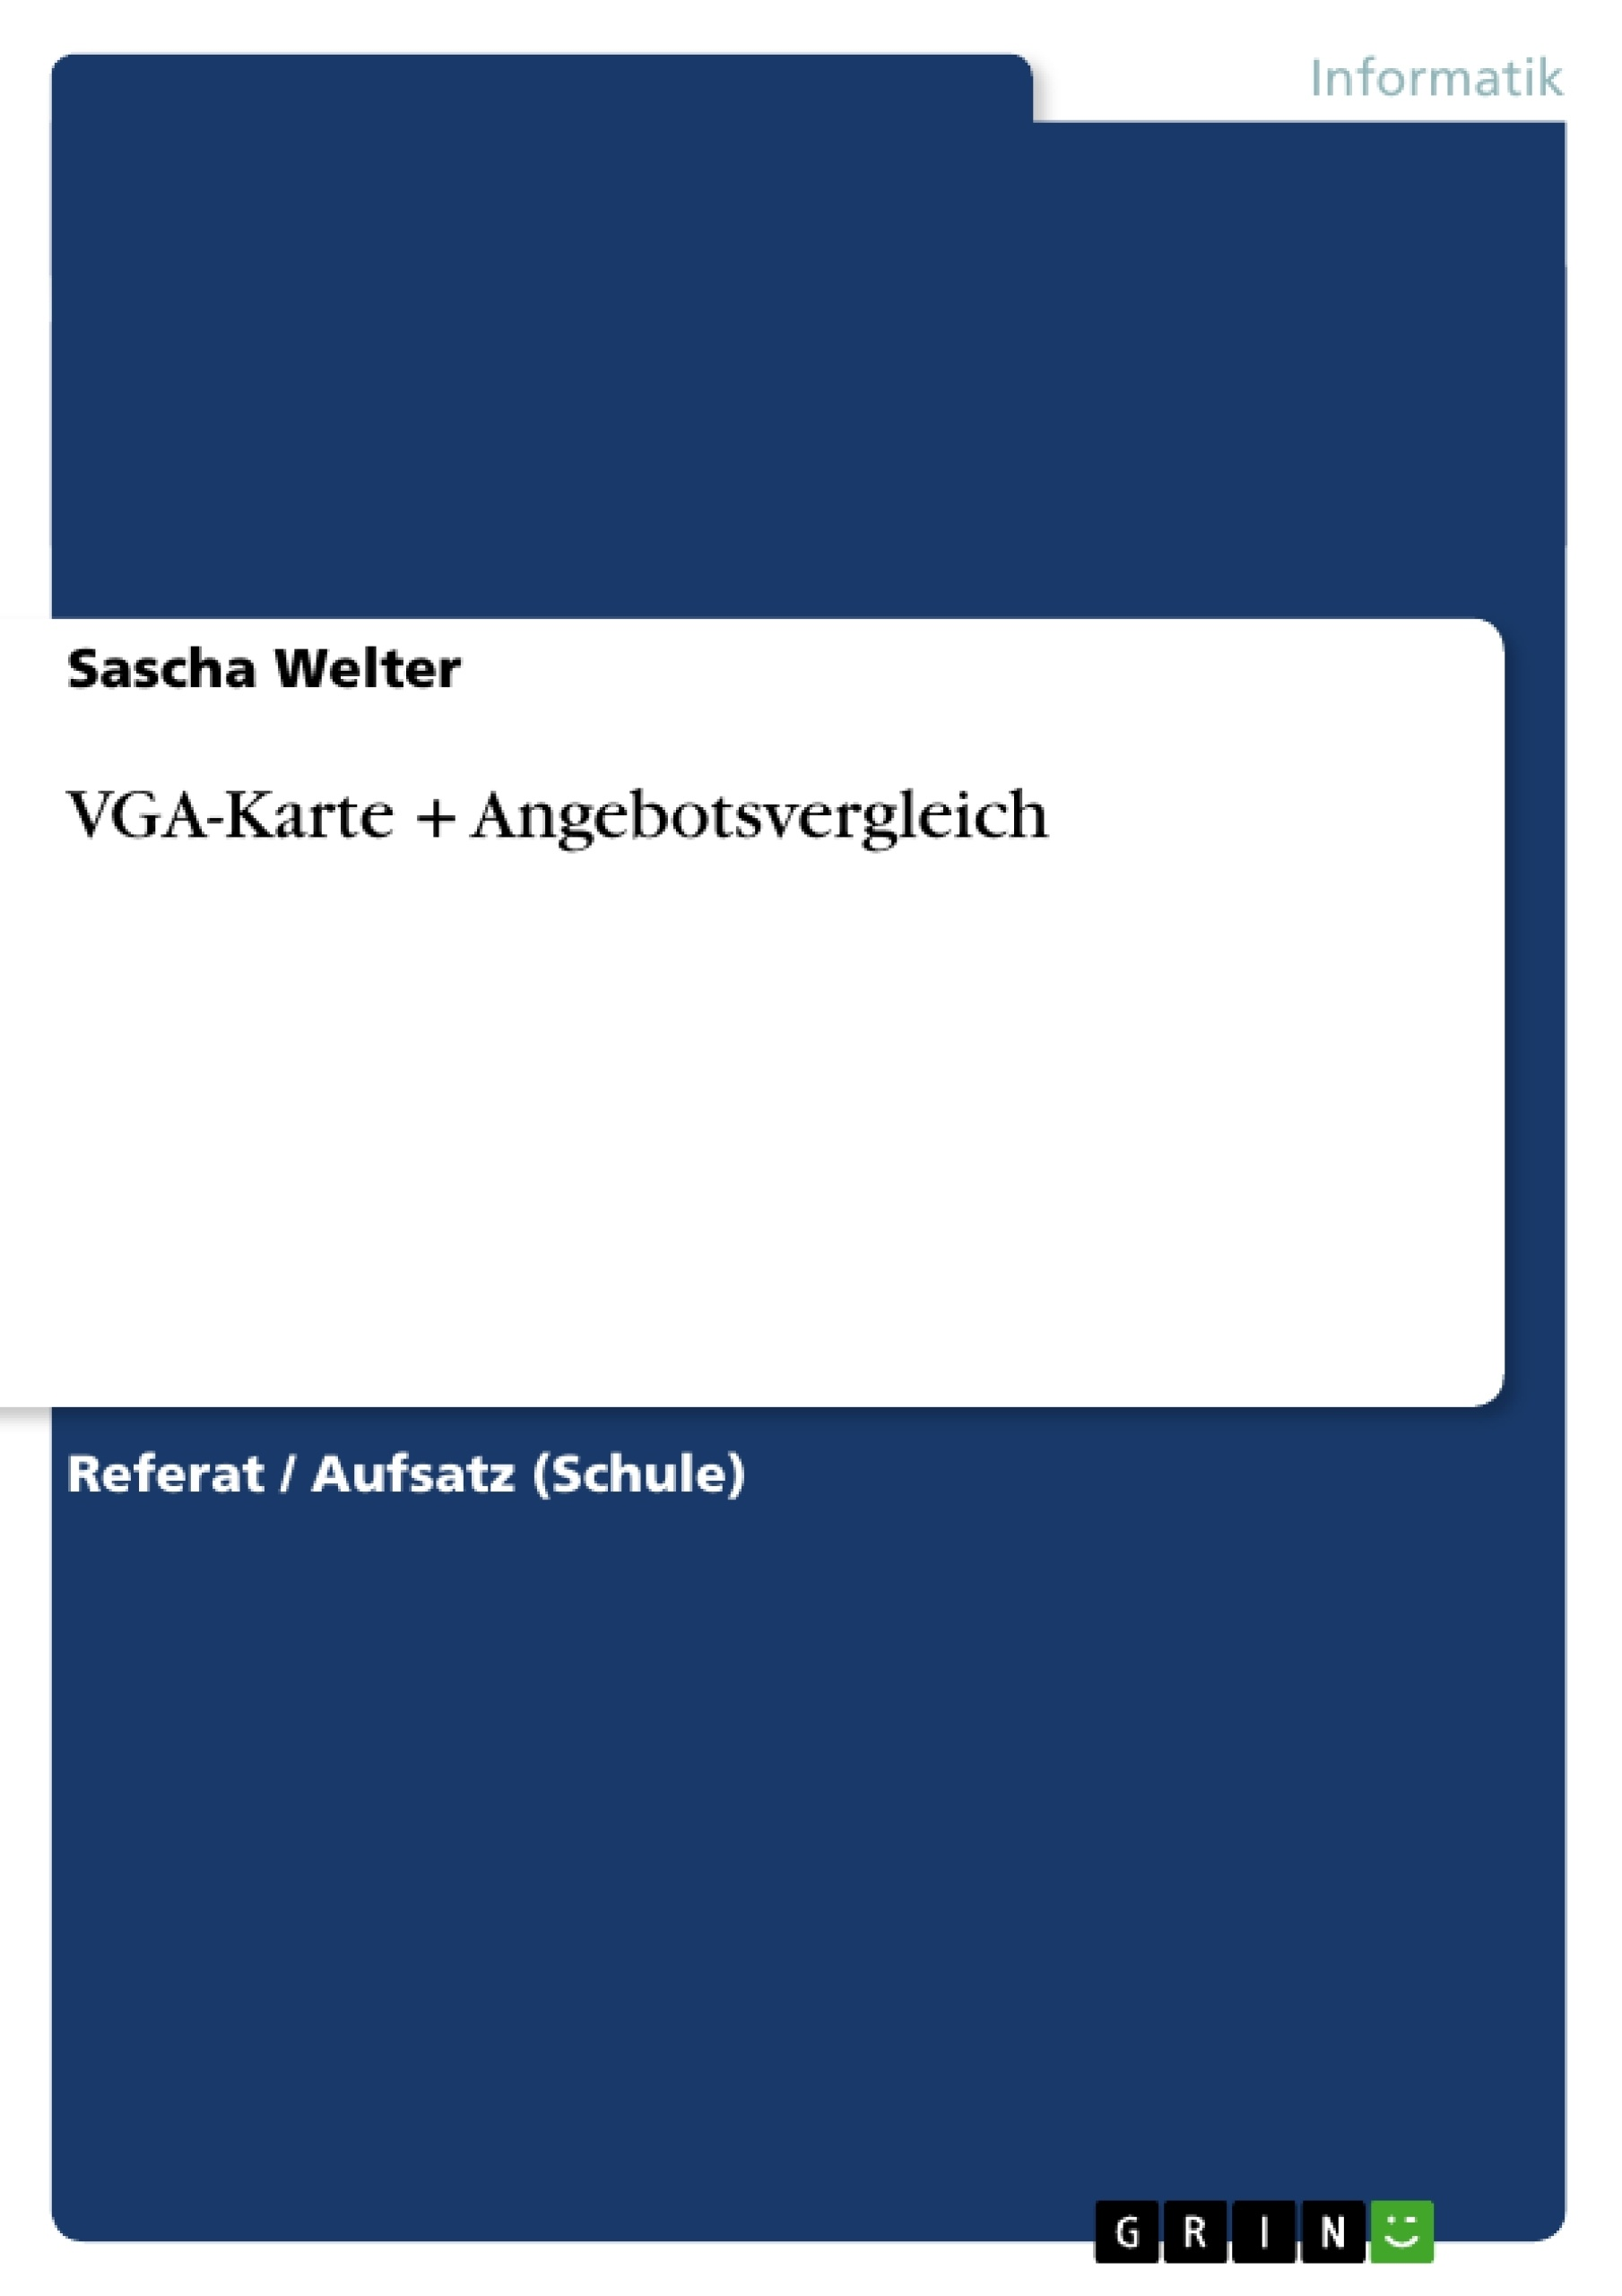 Titel: VGA-Karte + Angebotsvergleich